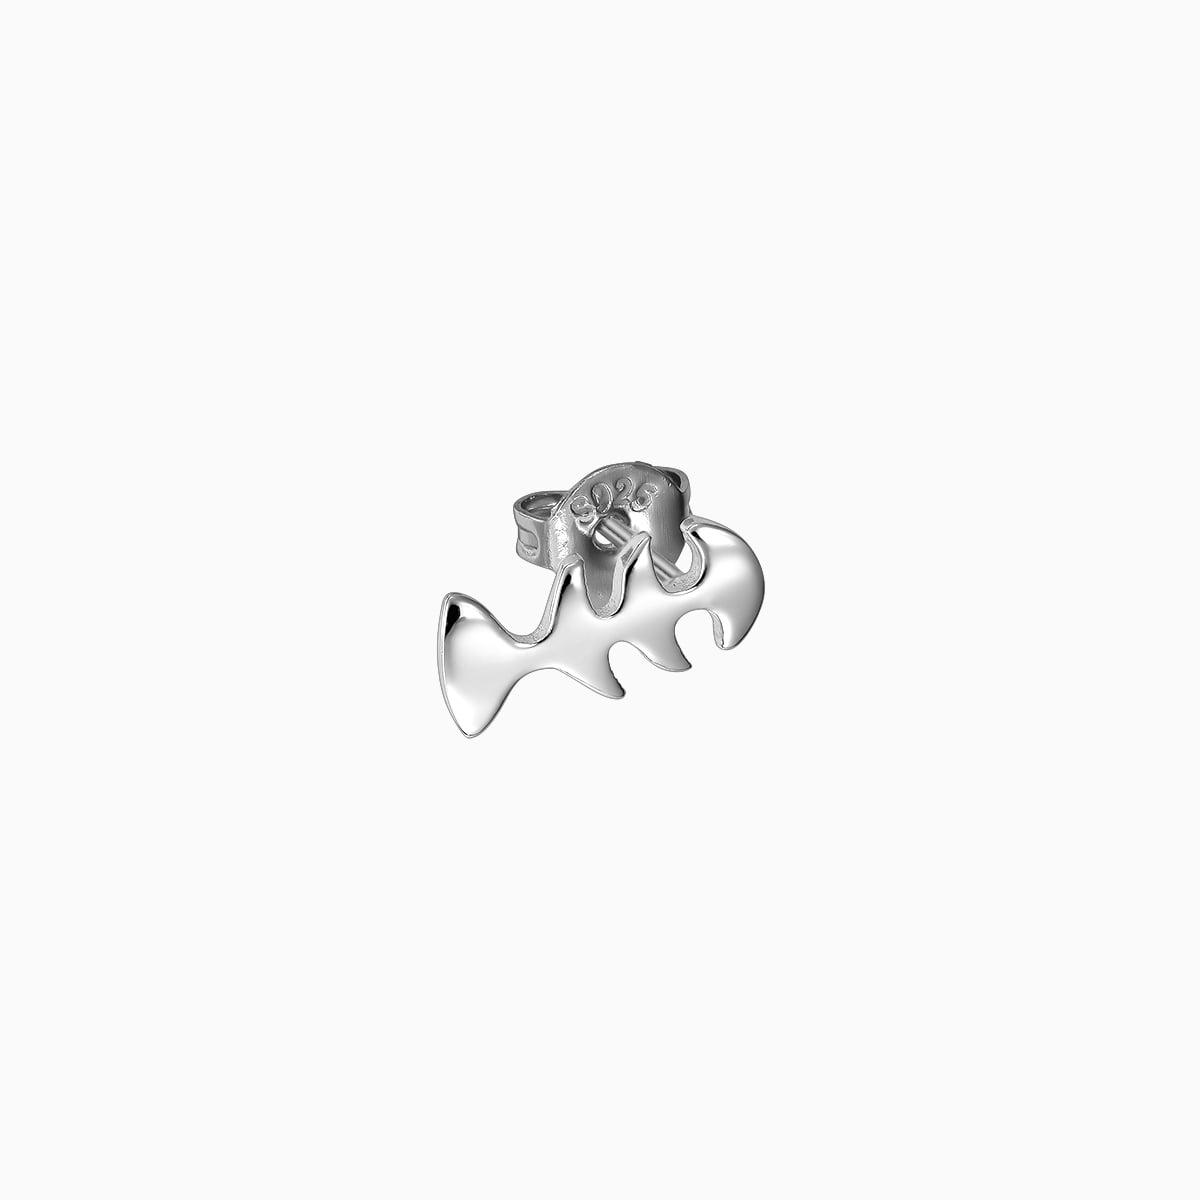 Cercei din argint Manissi CatFish Stud